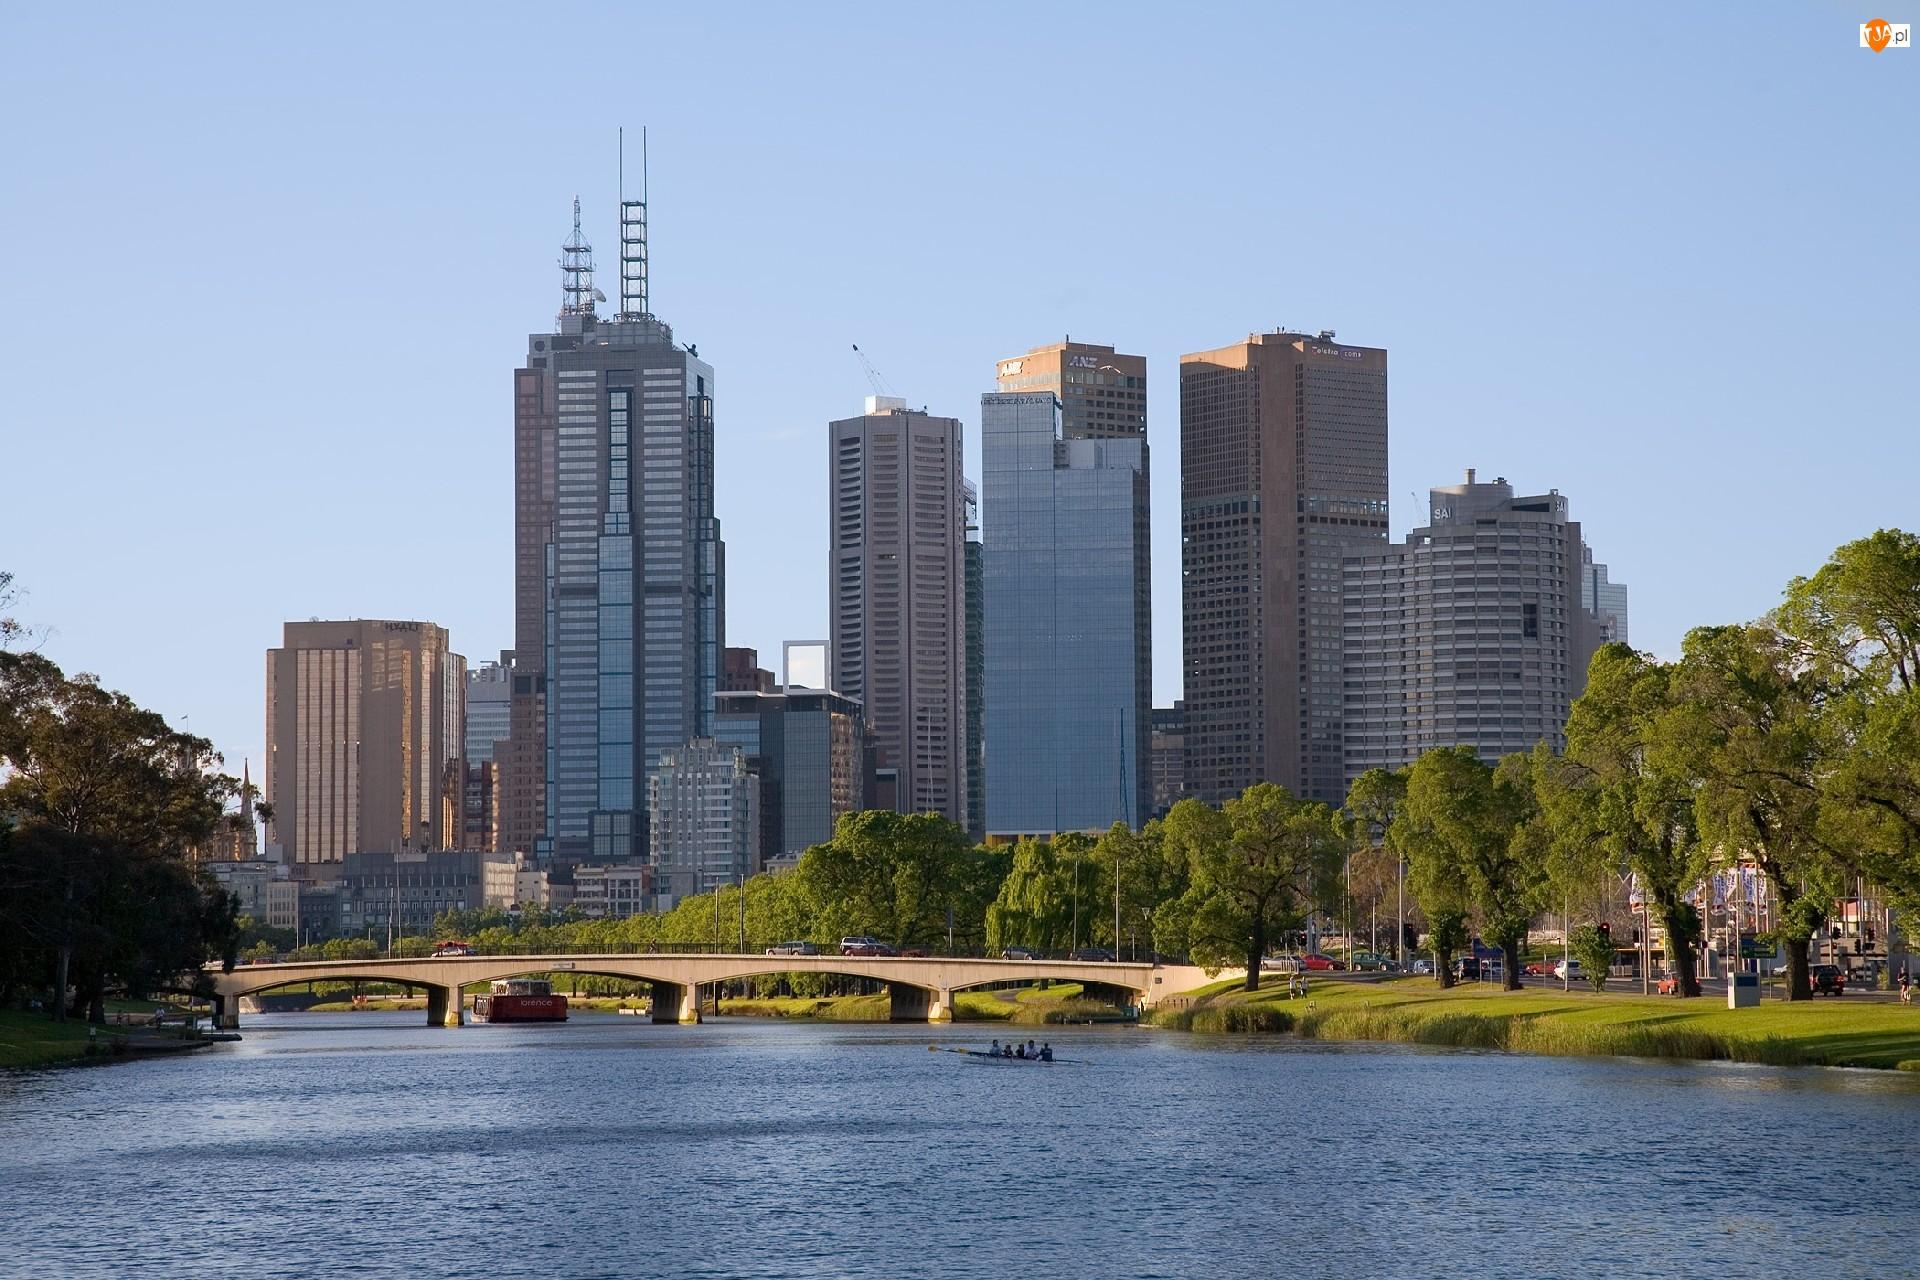 Melbourne, Architektura, Woda, Most